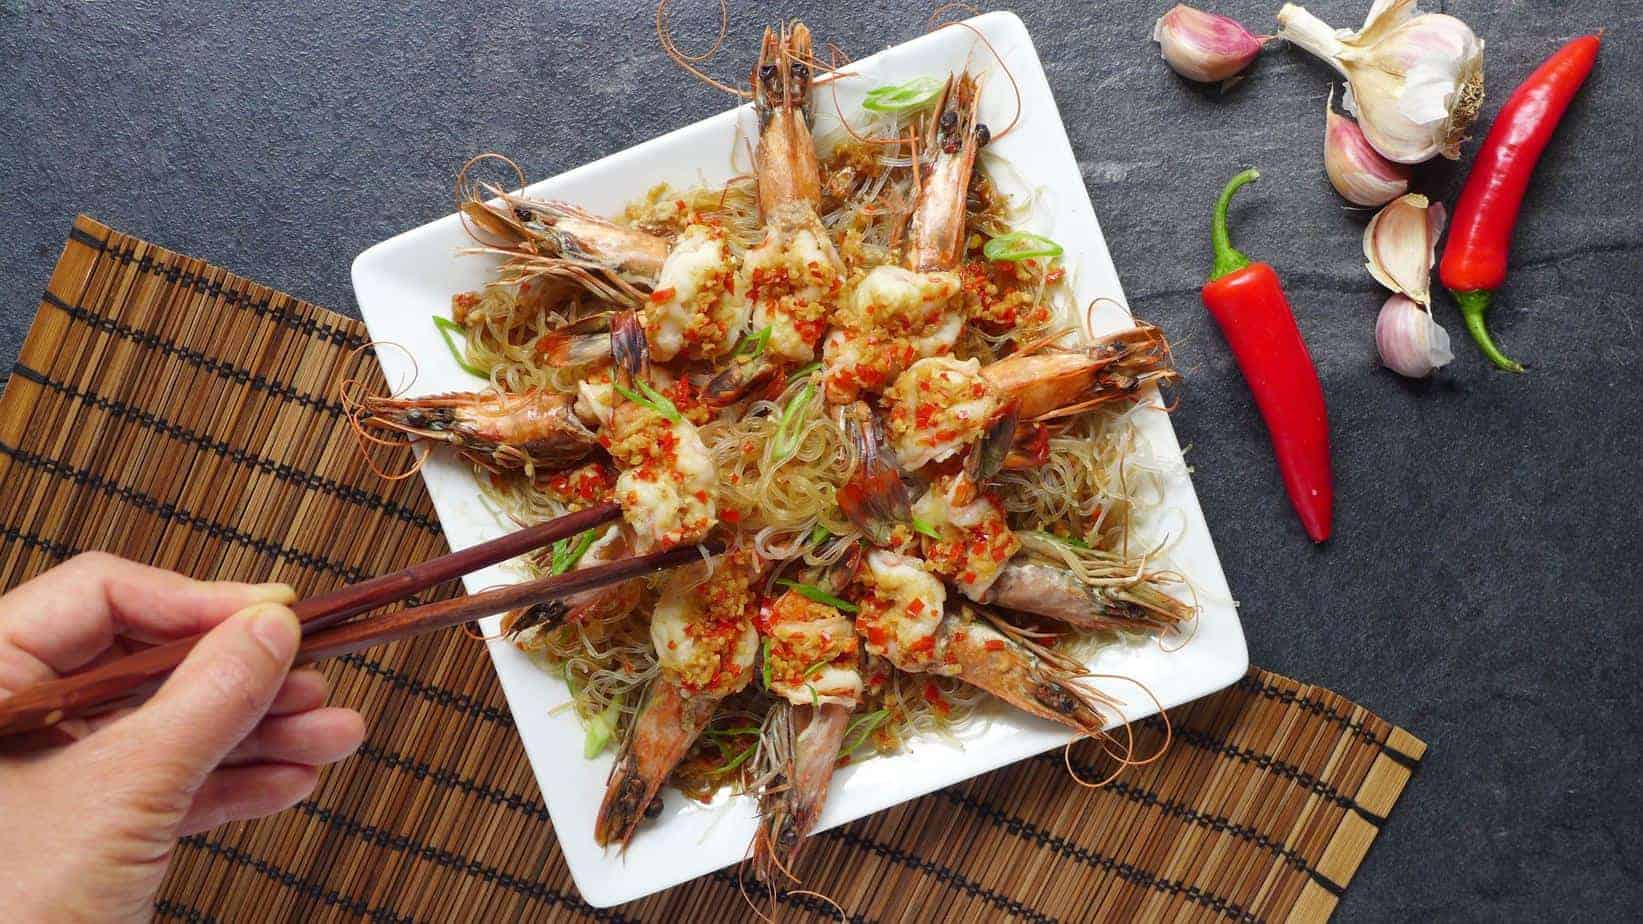 Steamed garlic prawns with vermicelli (蒜蓉粉丝蒸虾)